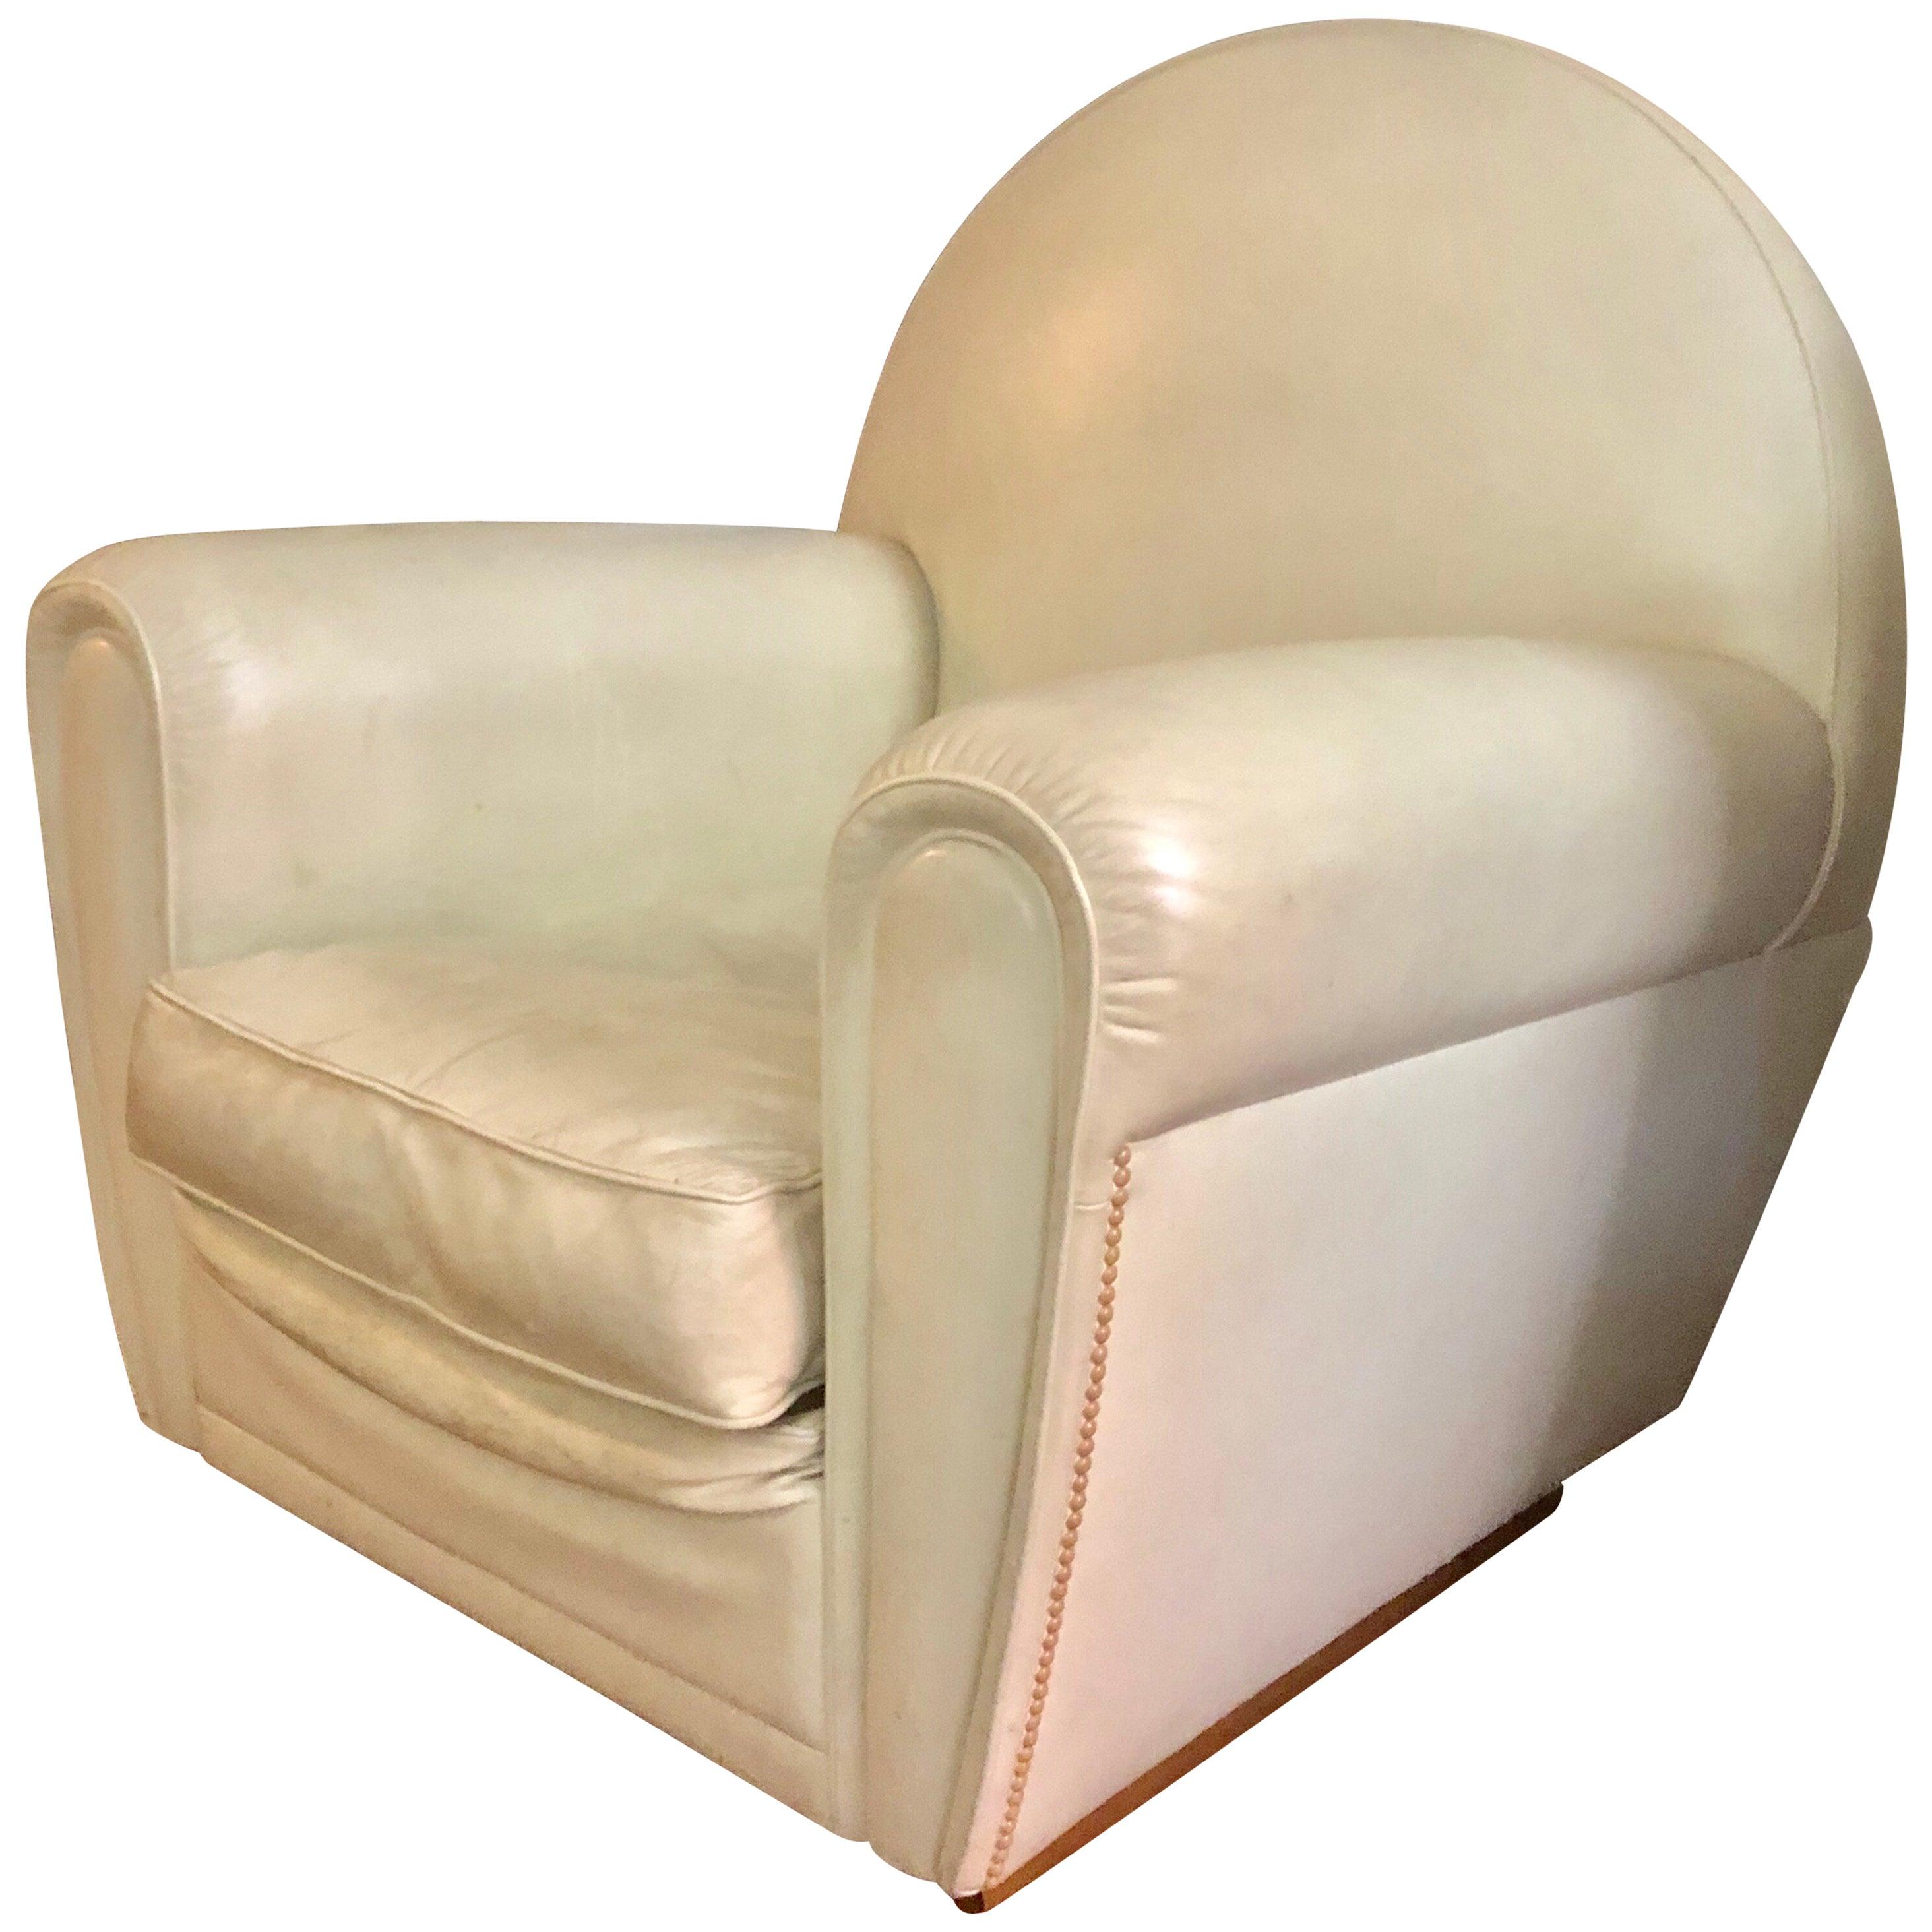 Pair of Italian Mid-Century Leather Armchairs/Lounge Chairs, Poltrona Frau, 1970